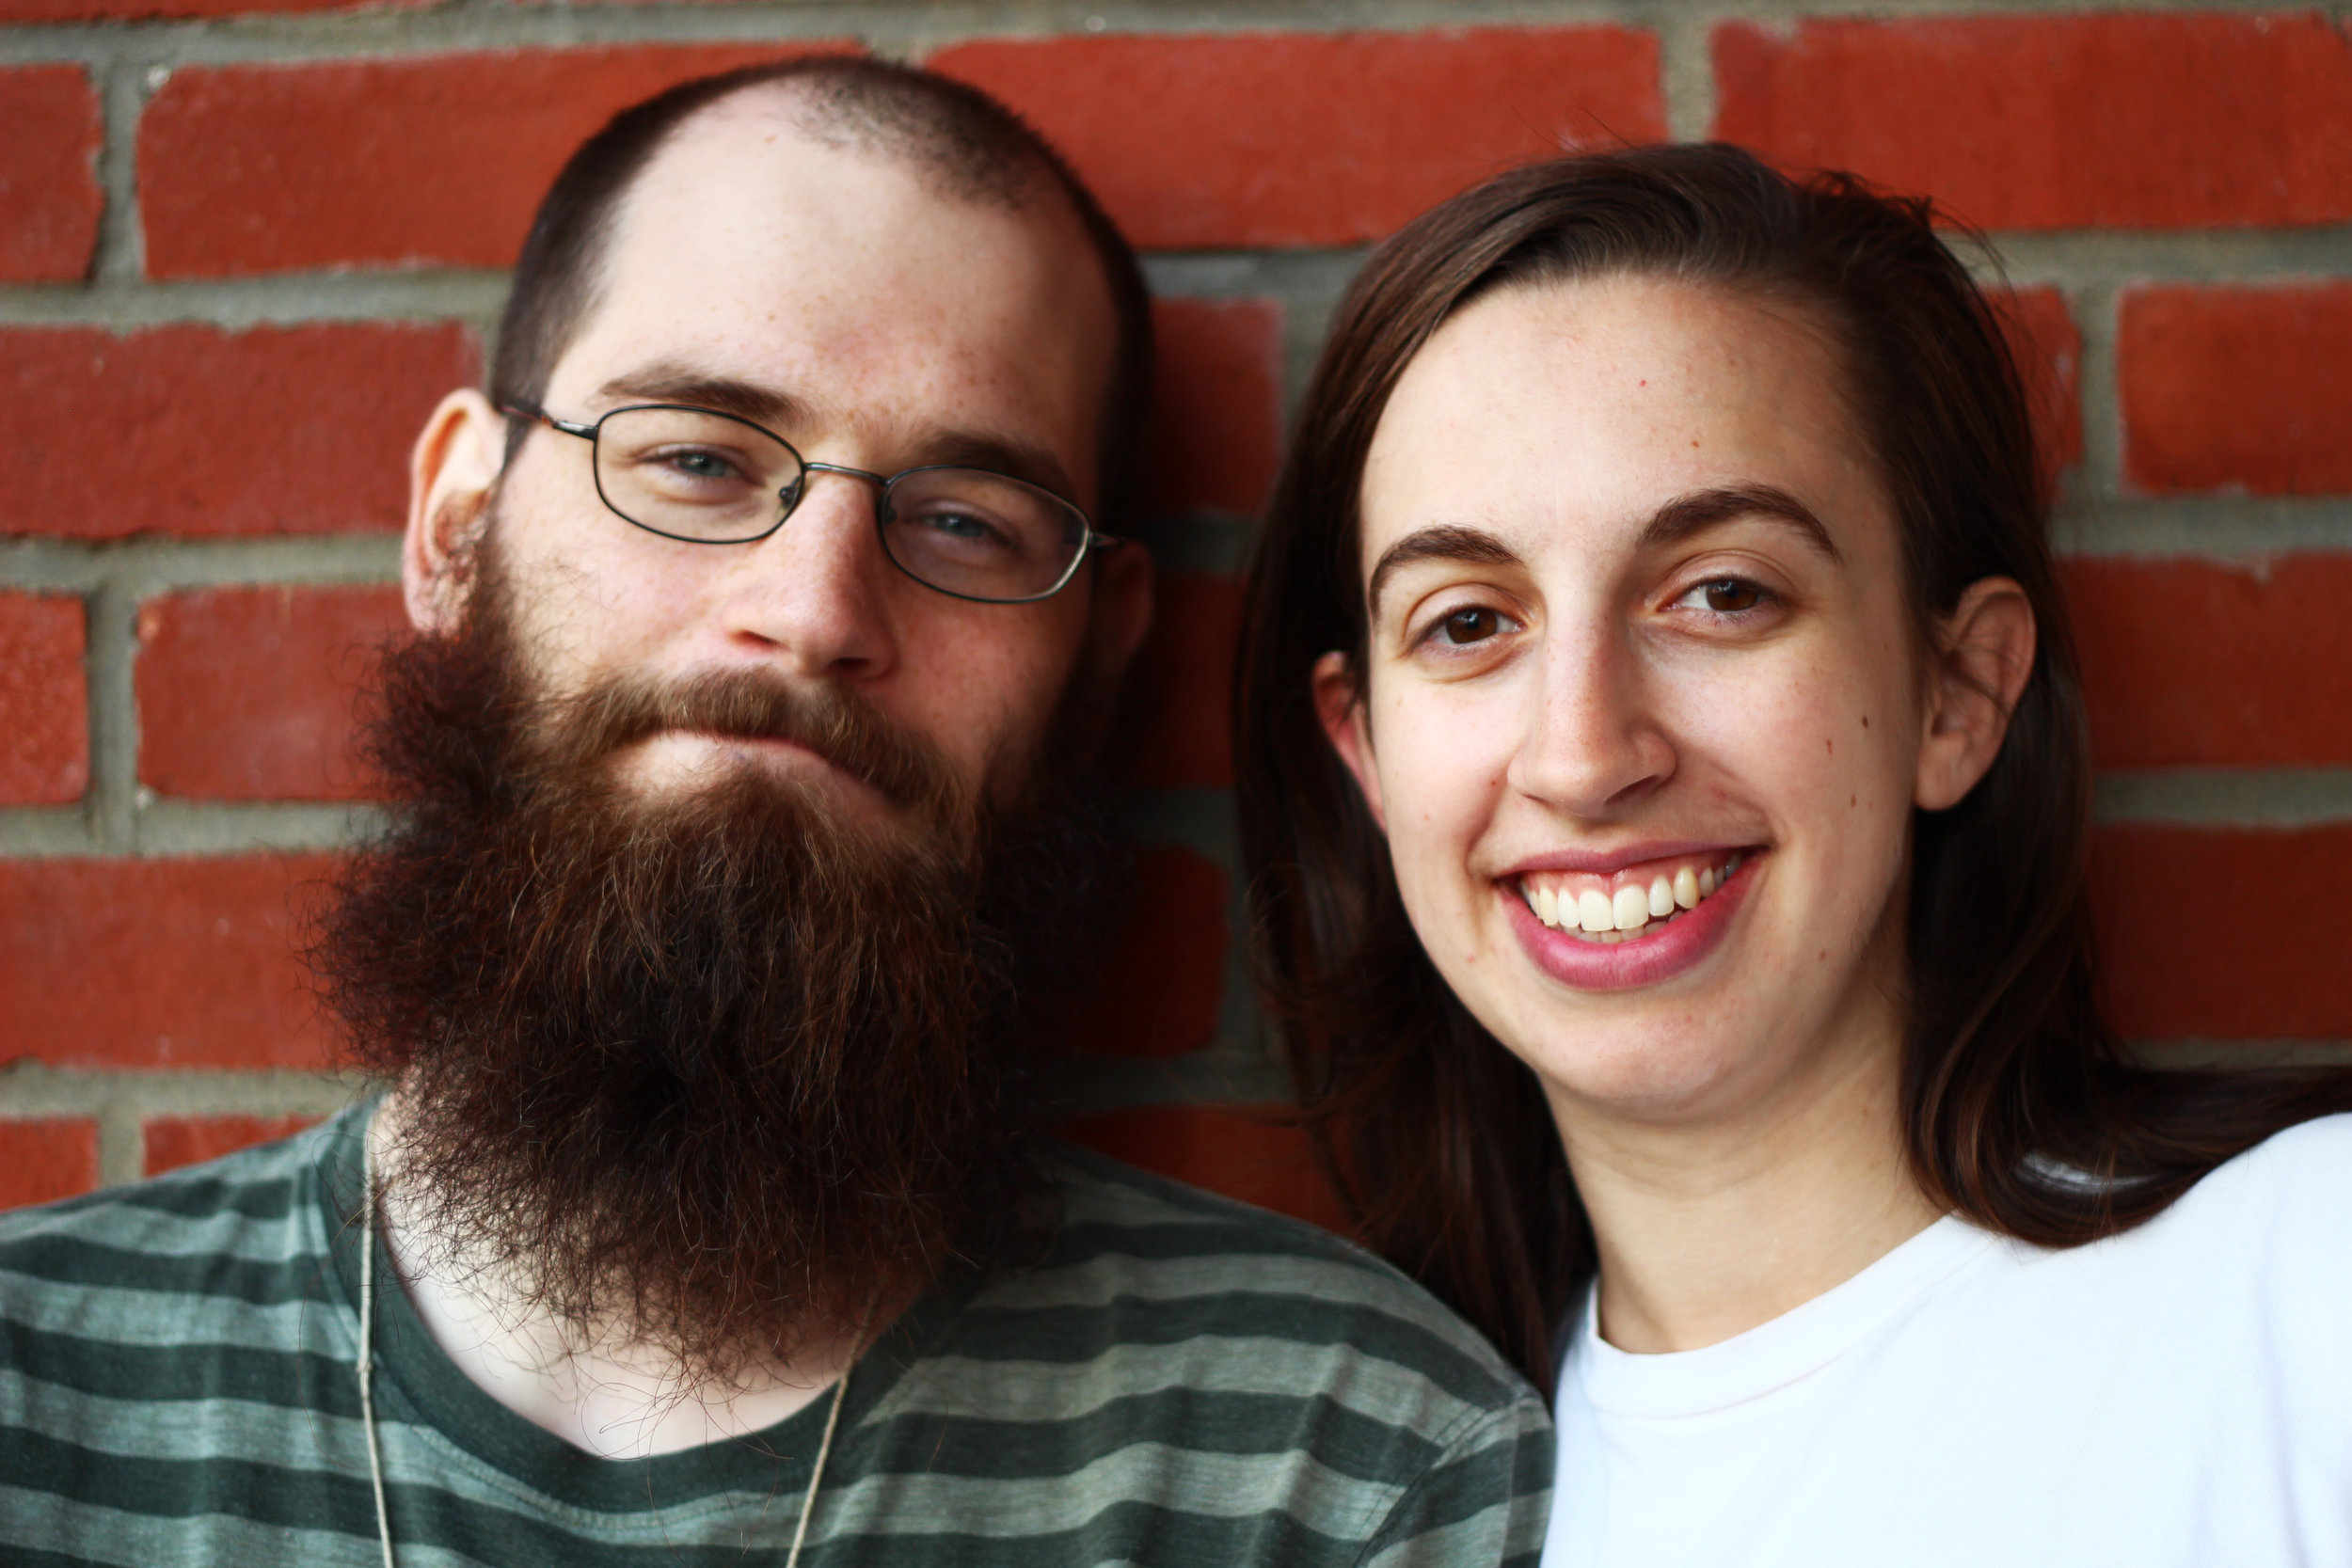 Alicia Zwicewicz & Josiah Henderson